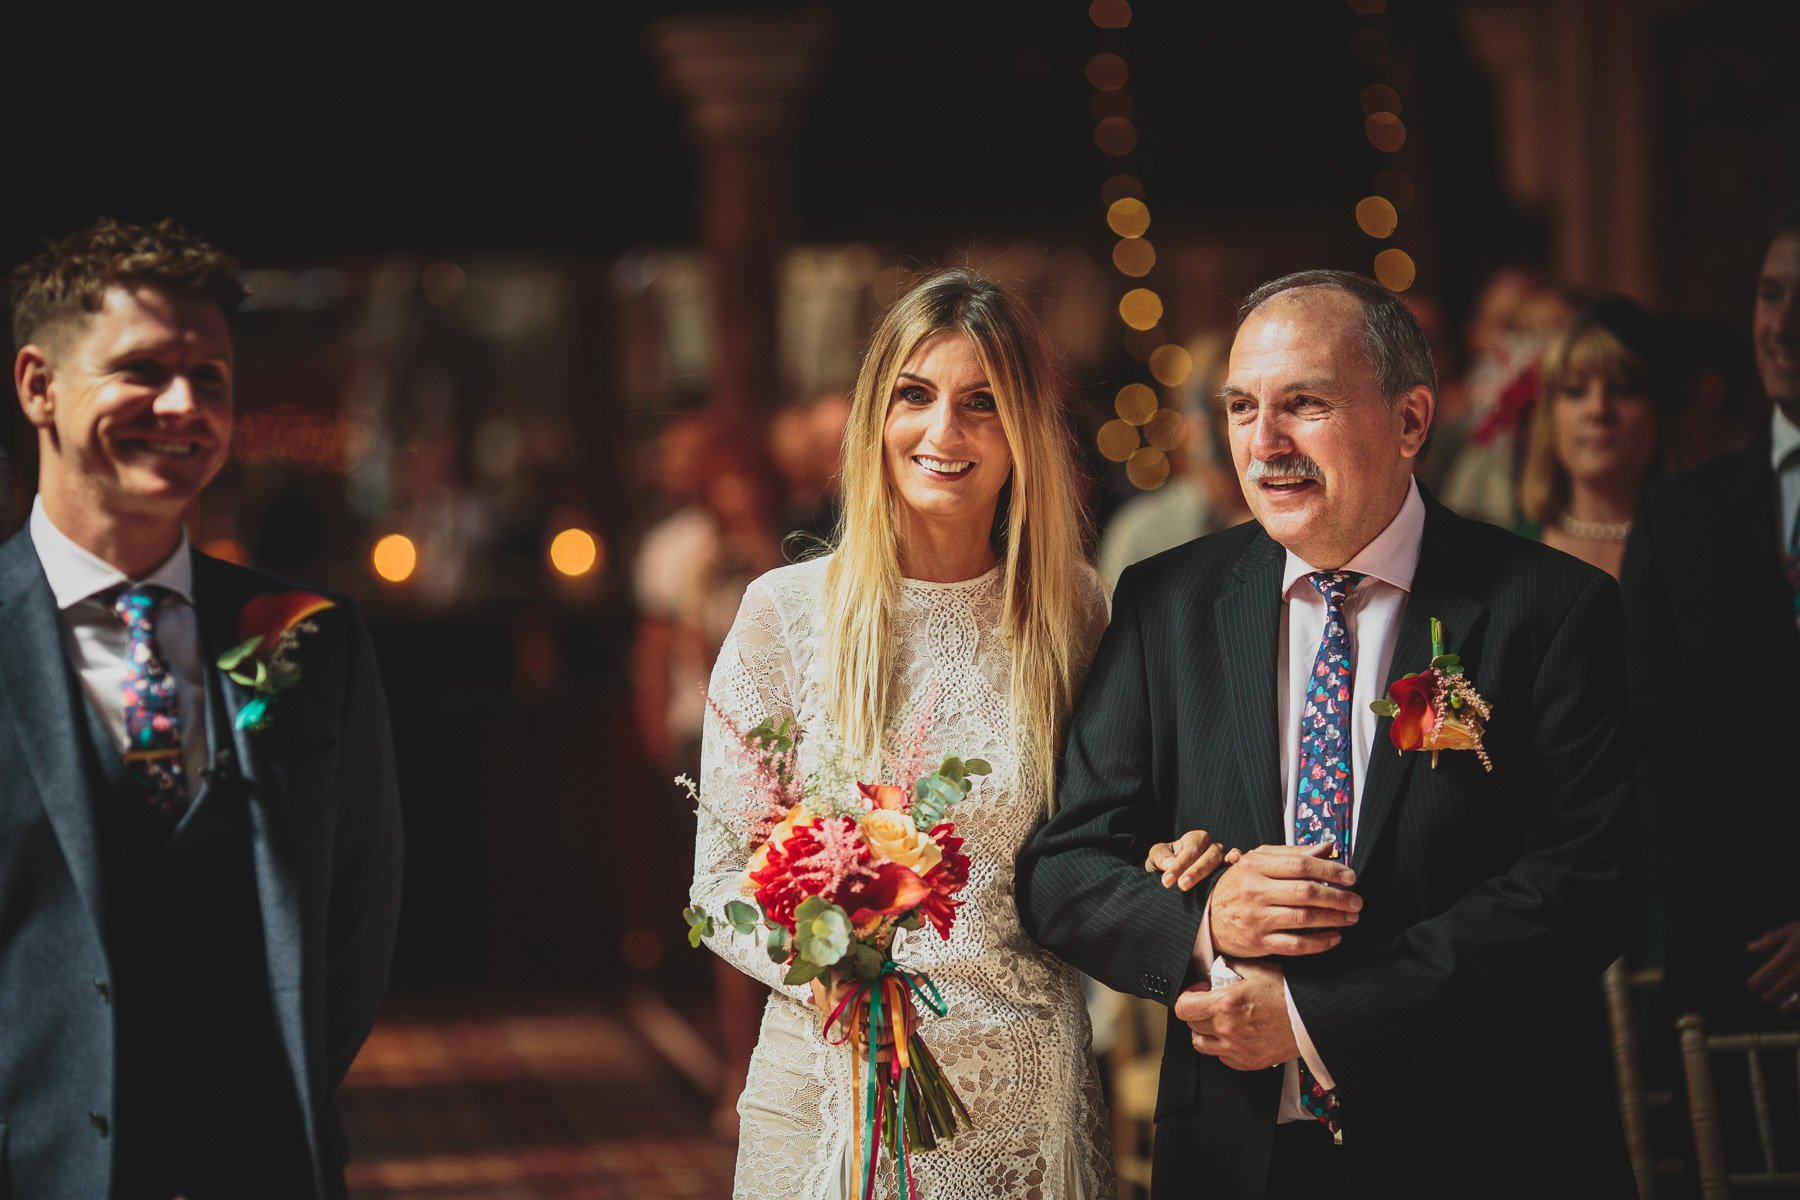 eastbourne-wedding-photography-hannah-tom-023